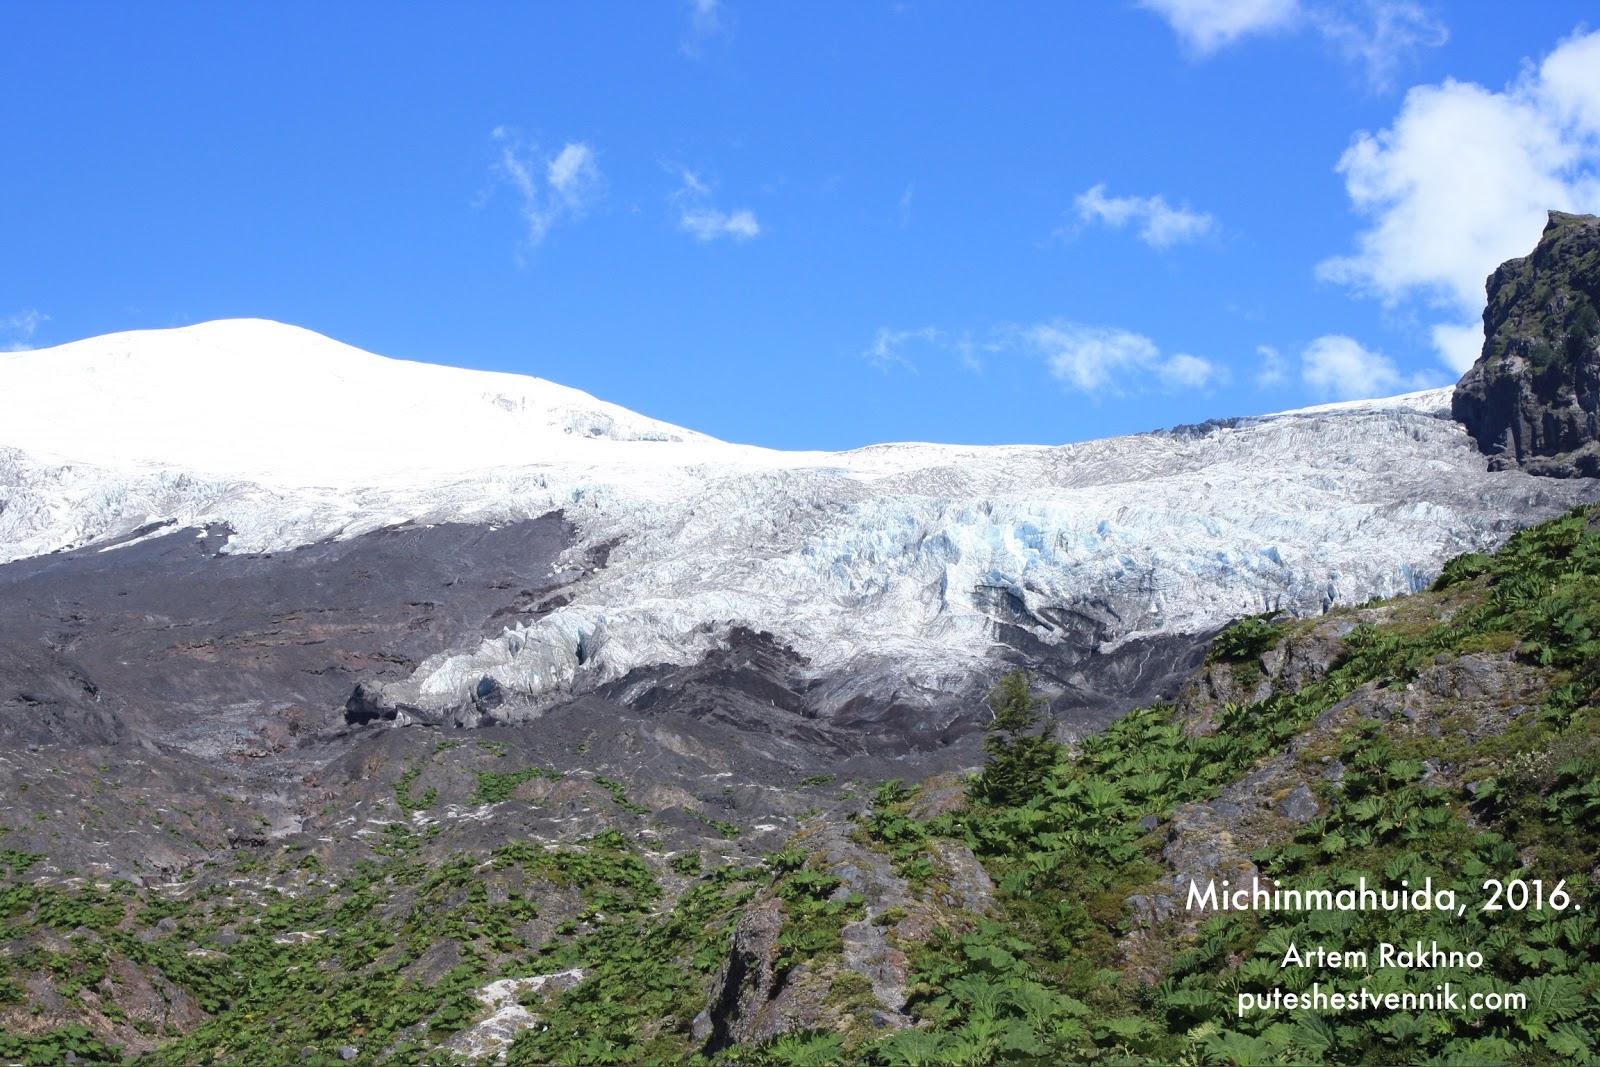 Ледник в горах возле вулкана Мичинмахуида